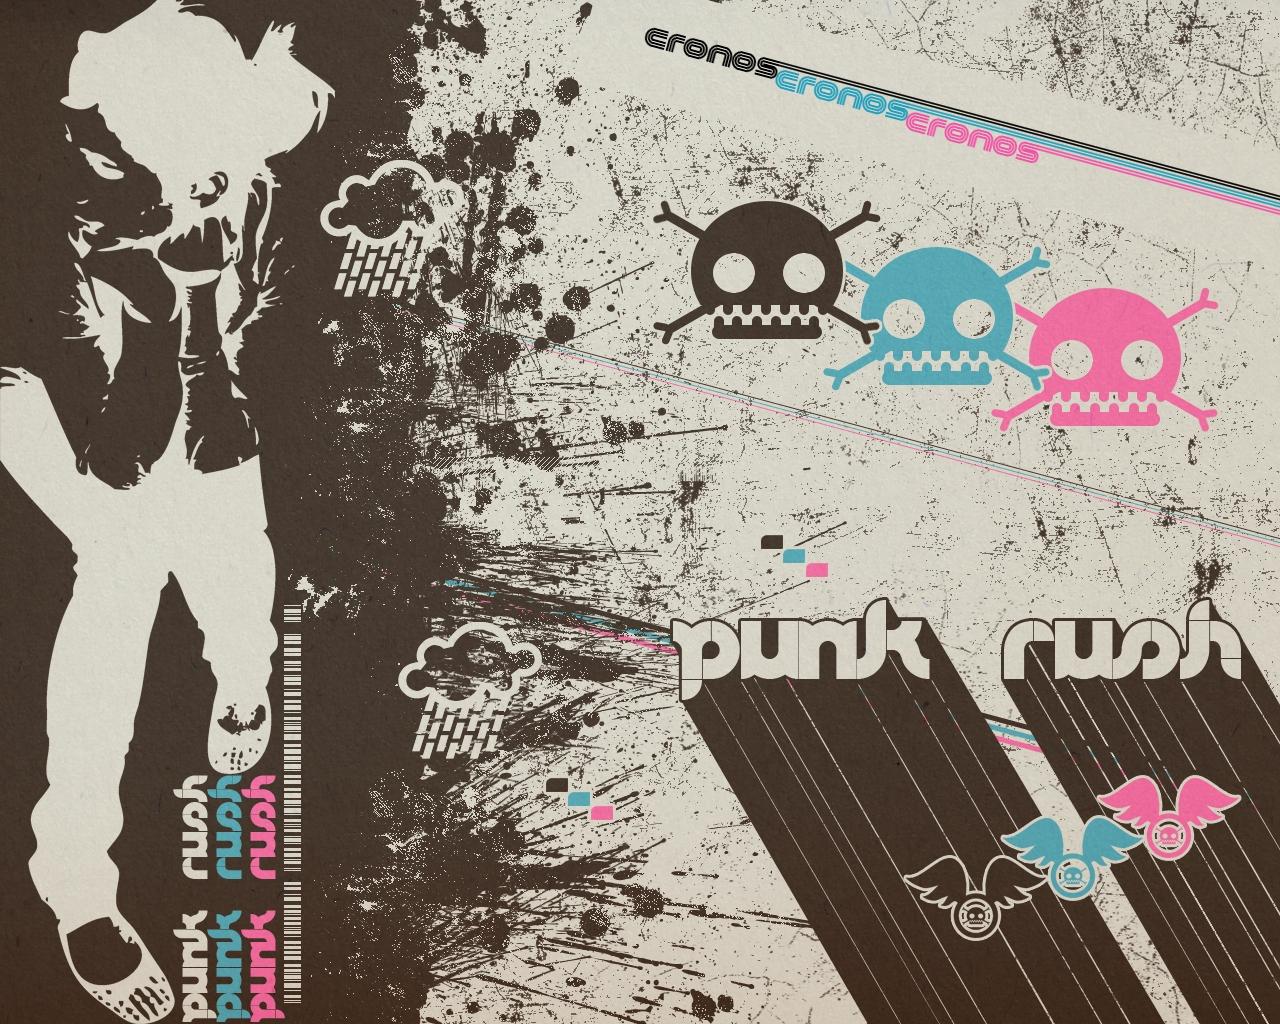 http://1.bp.blogspot.com/_Iq1fkO6qus0/TUNWNNUl02I/AAAAAAAAAo0/rATQLc8XW0U/s1600/cool-punk-wallpaper_13120113.jpeg